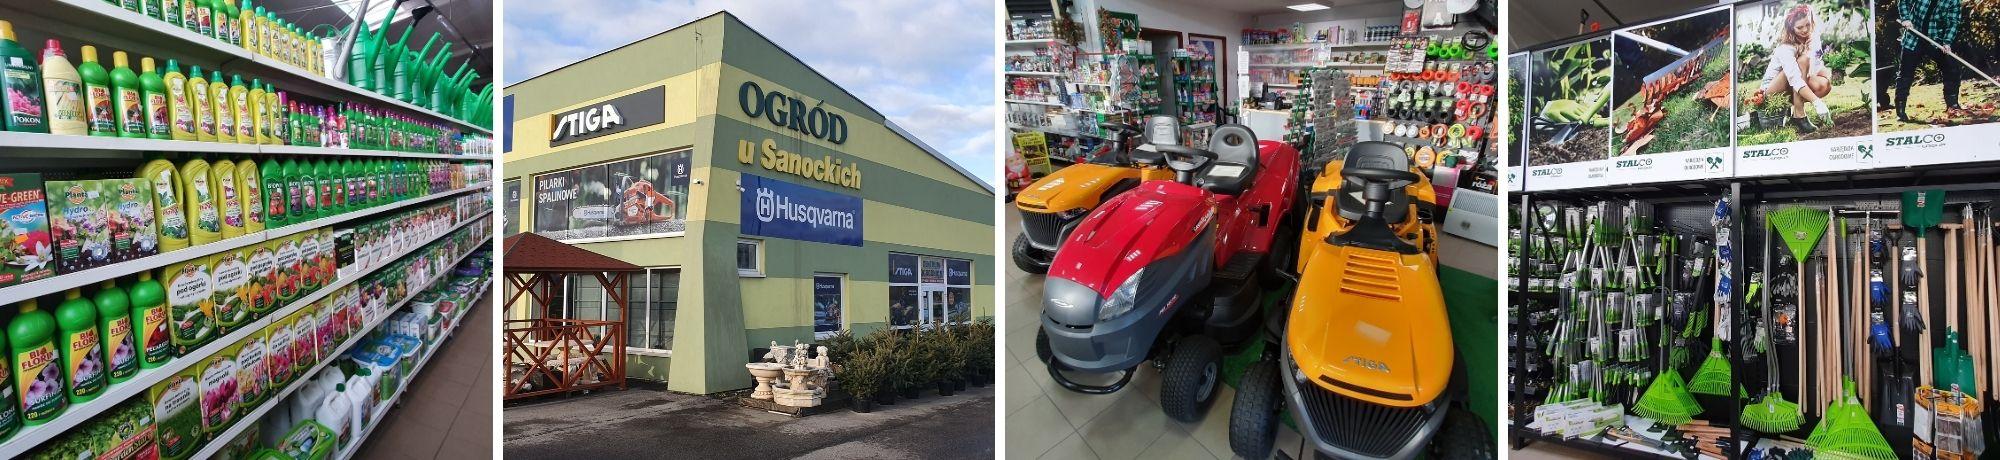 Husqvarna Gorlice, Stiga Gorlice. Traktor Ogrodowy, Kosiarki, akcesoria ogrodowe, serwis Husqvarna